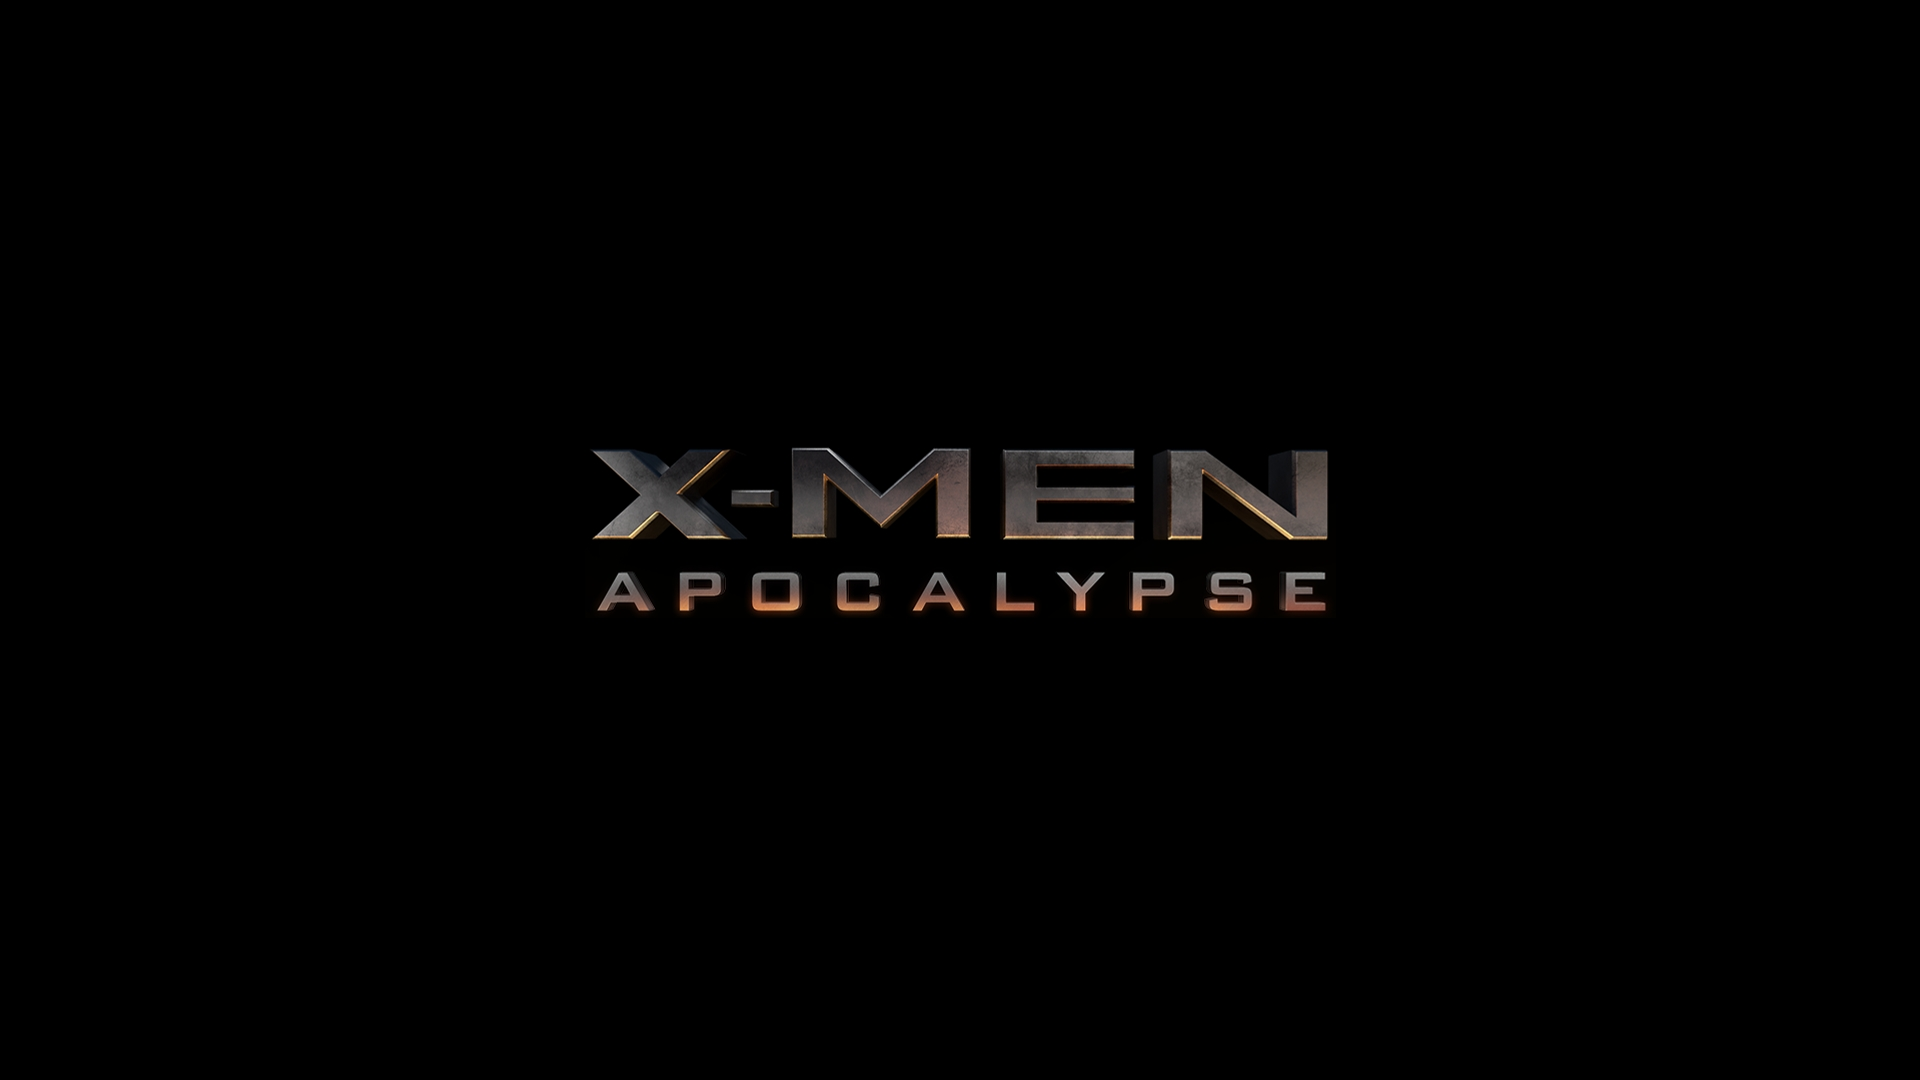 Men Apocalypse logo 1920x1080